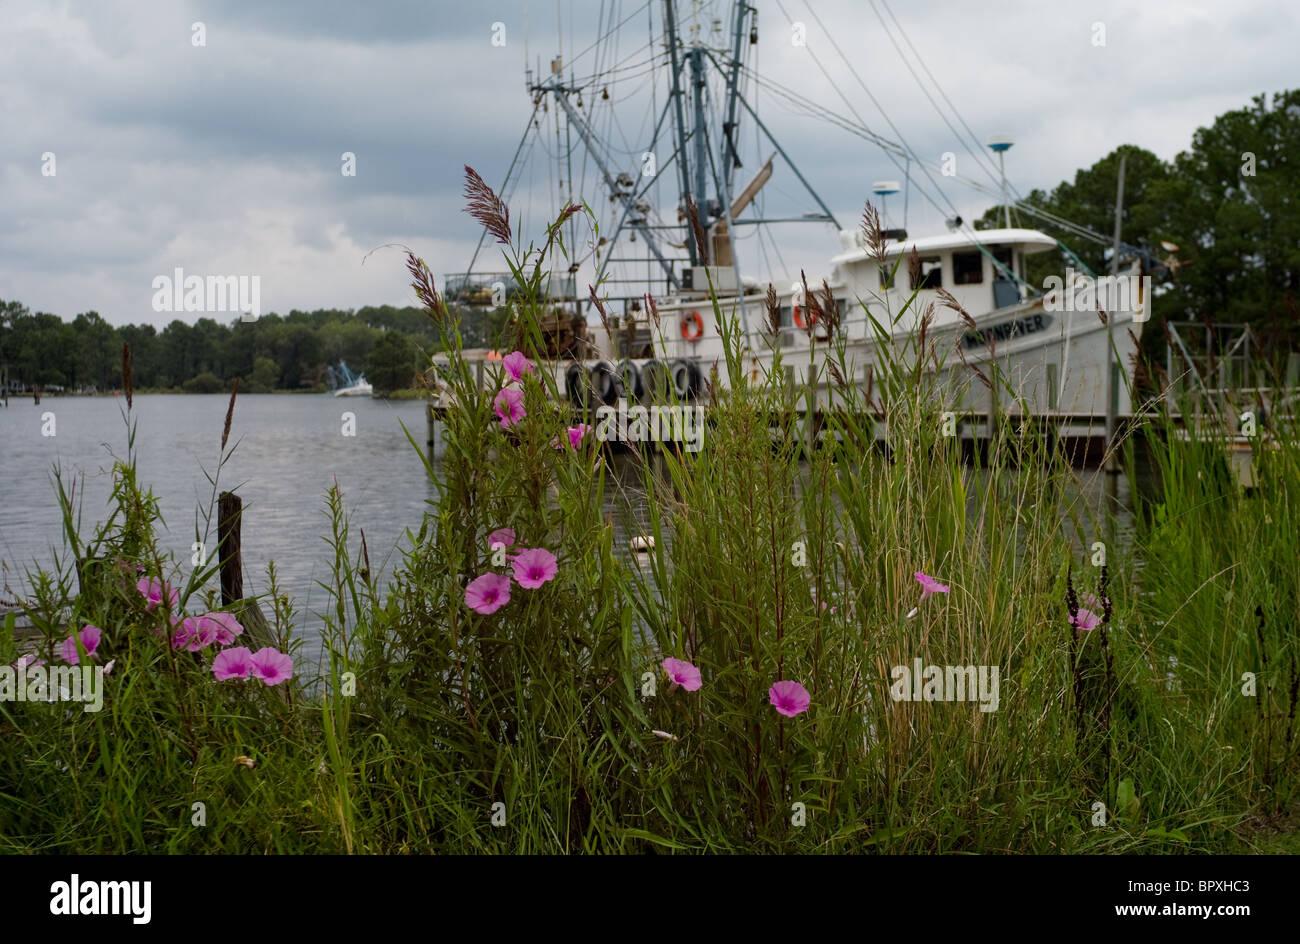 Shrimp trawler and morning glories in Pamlico Beach, North Carolina, USA. - Stock Image